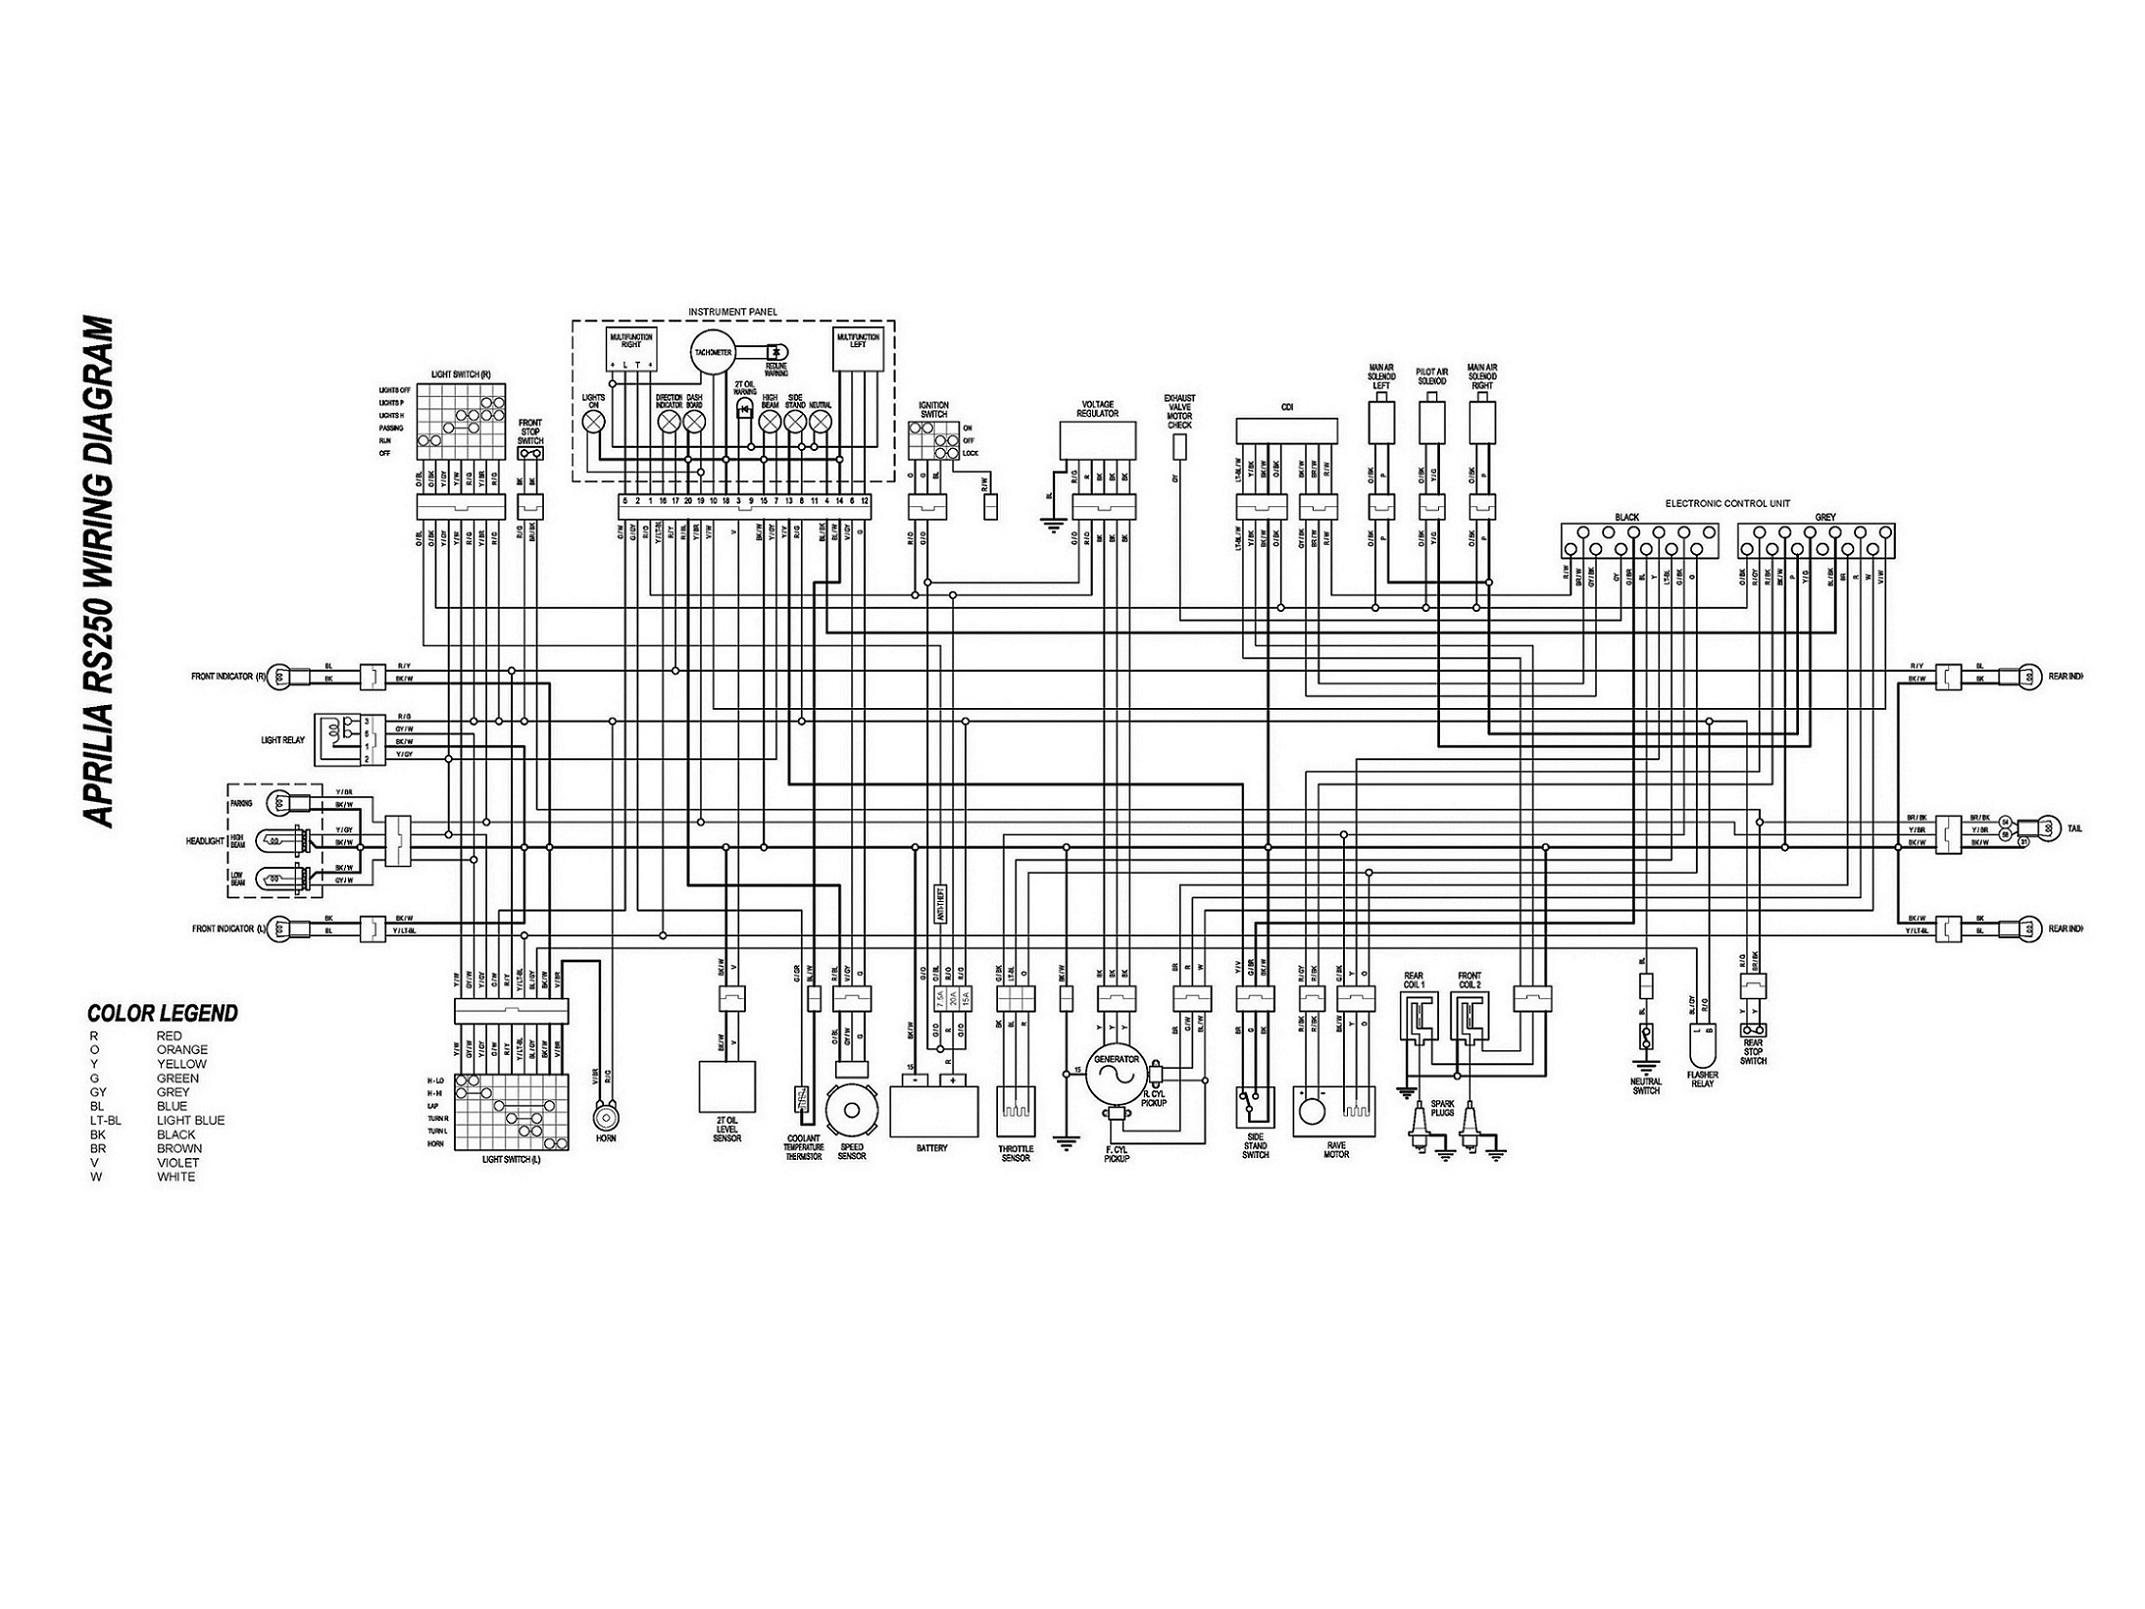 ia tuono wiring diagram ia wiring diagrams ia rsvr wiring diagram ia wiring diagrams online